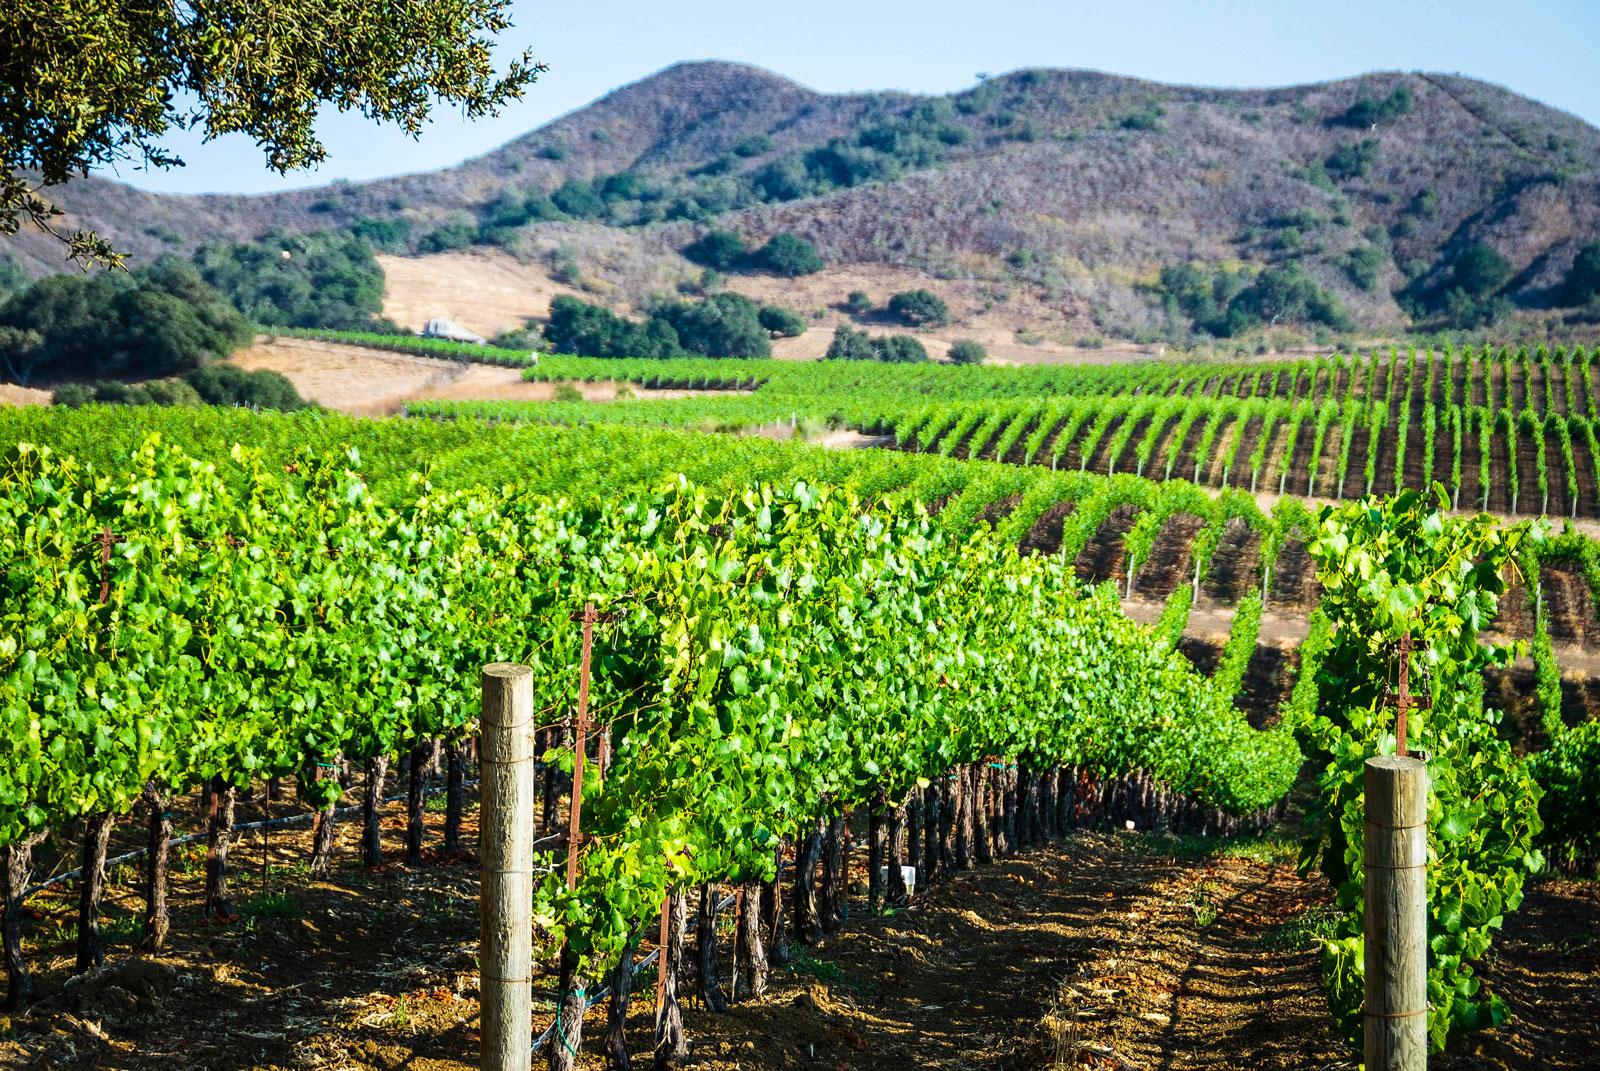 Vineyard in Santa Barbara County